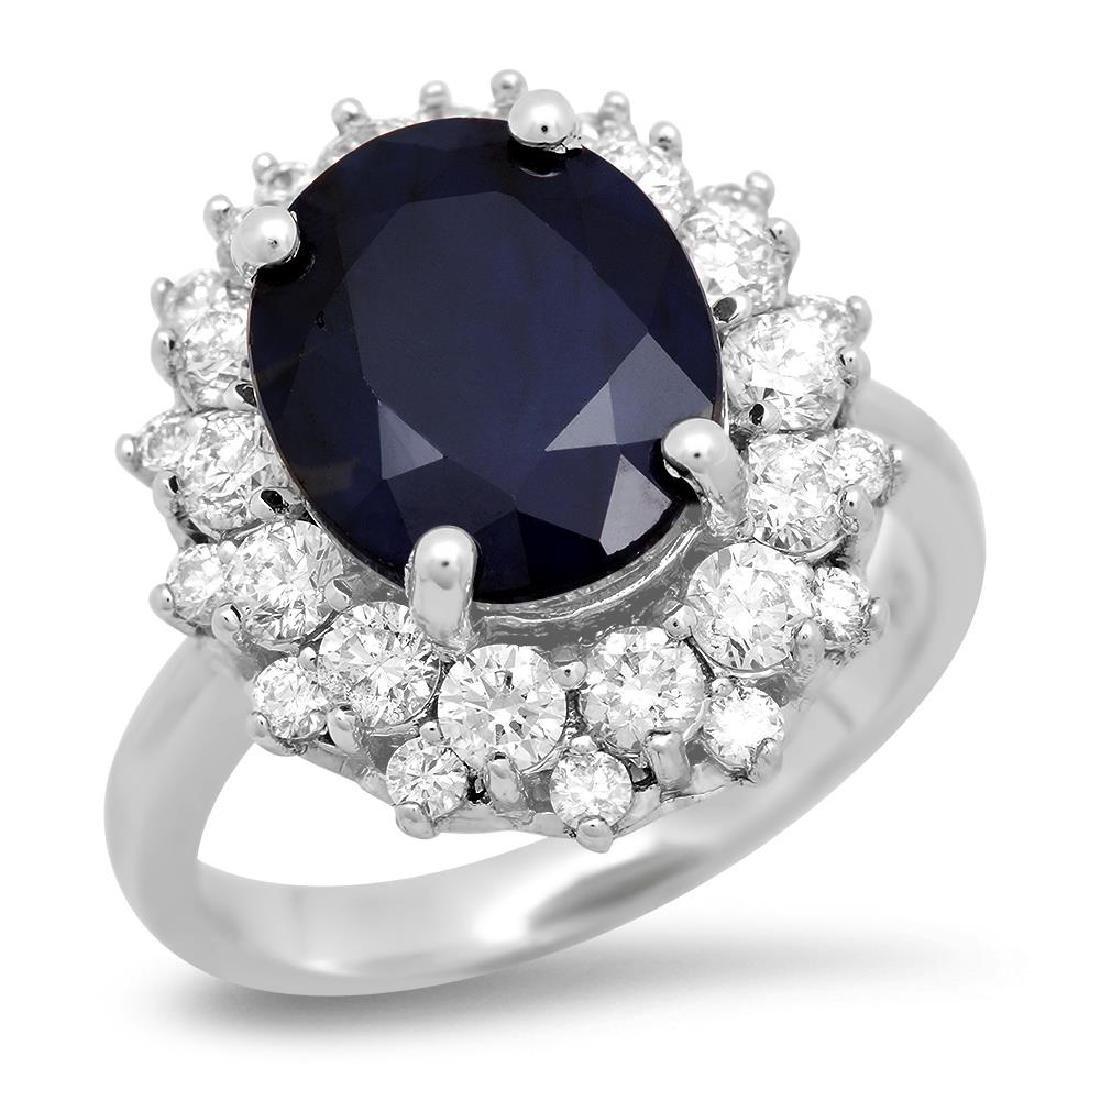 14K Gold 6.46ct Sapphire 1.42cts Diamond Ring